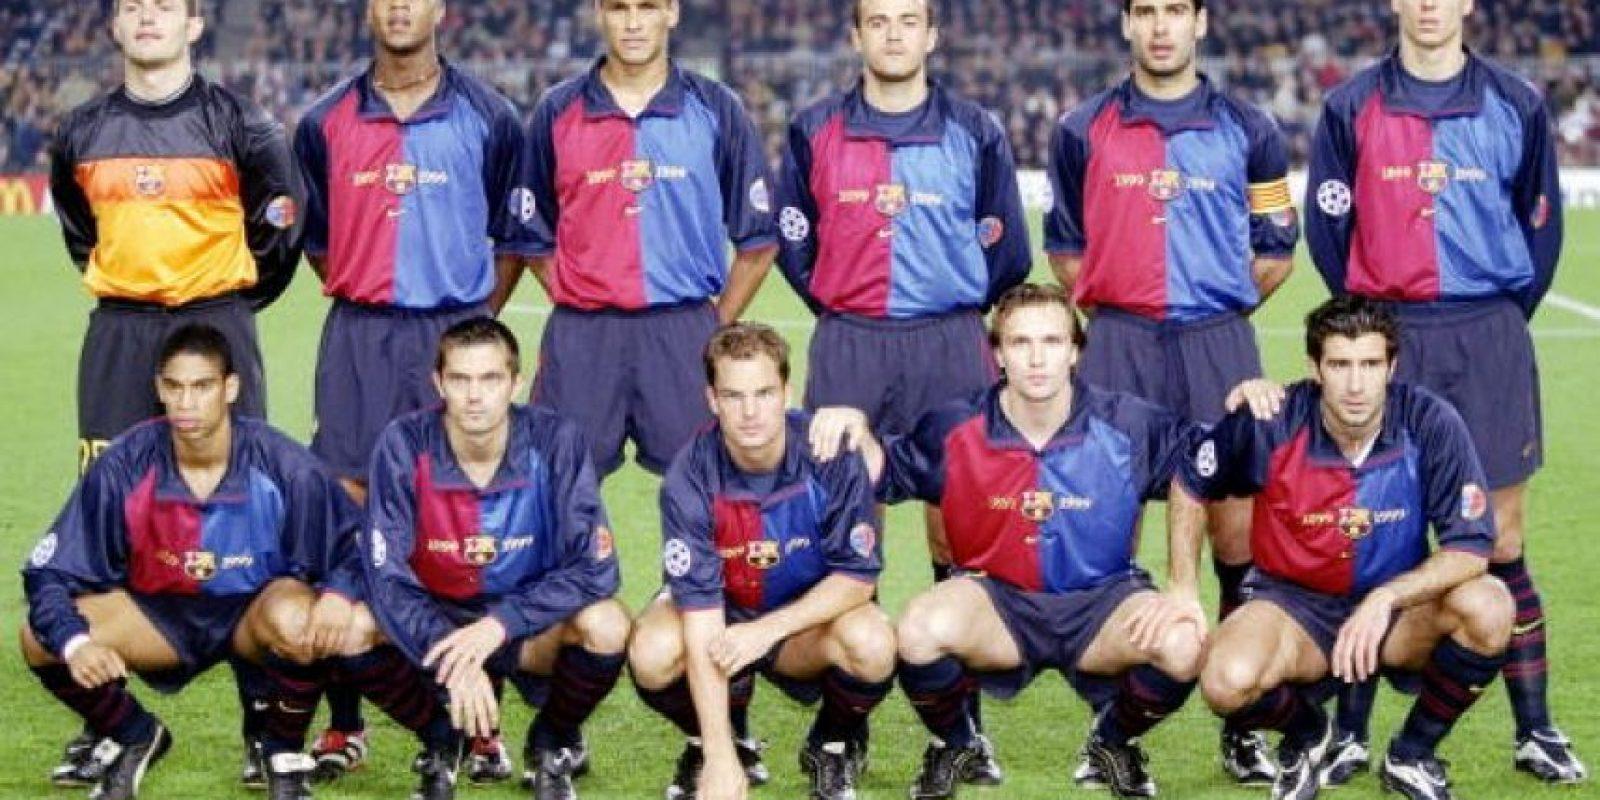 Nike 1999 Foto:Publinews